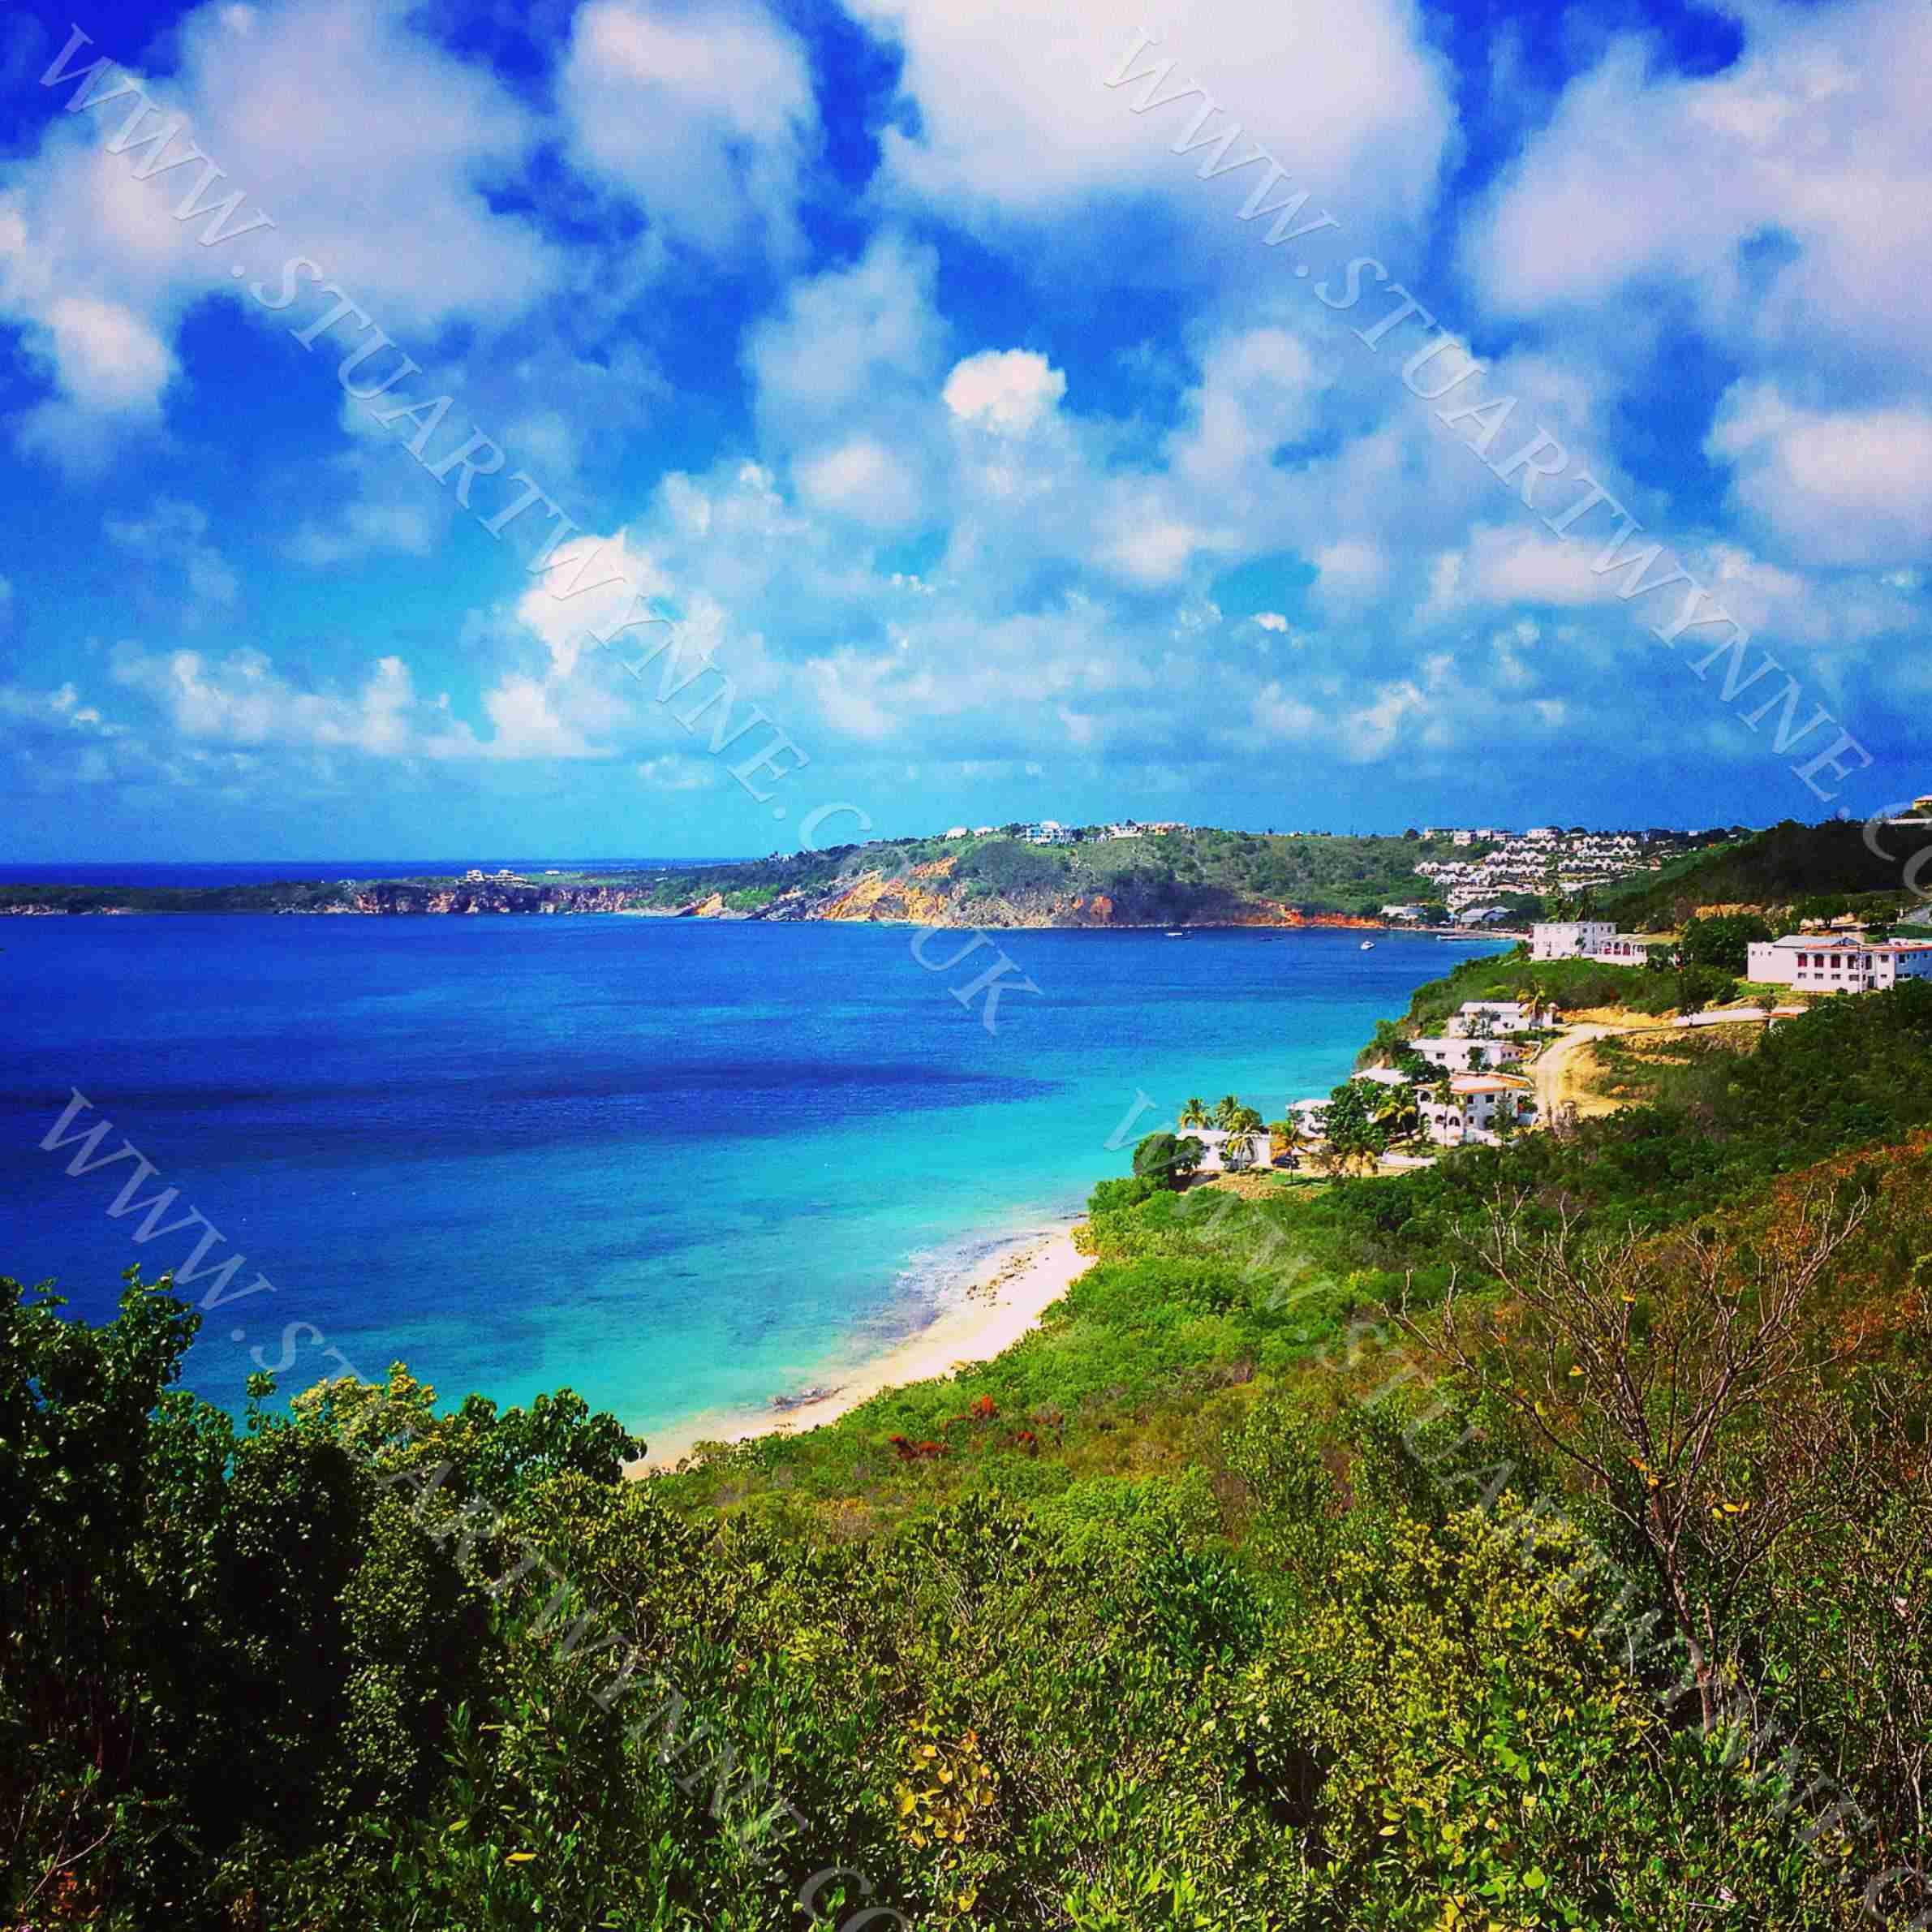 Katouche View Anguilla